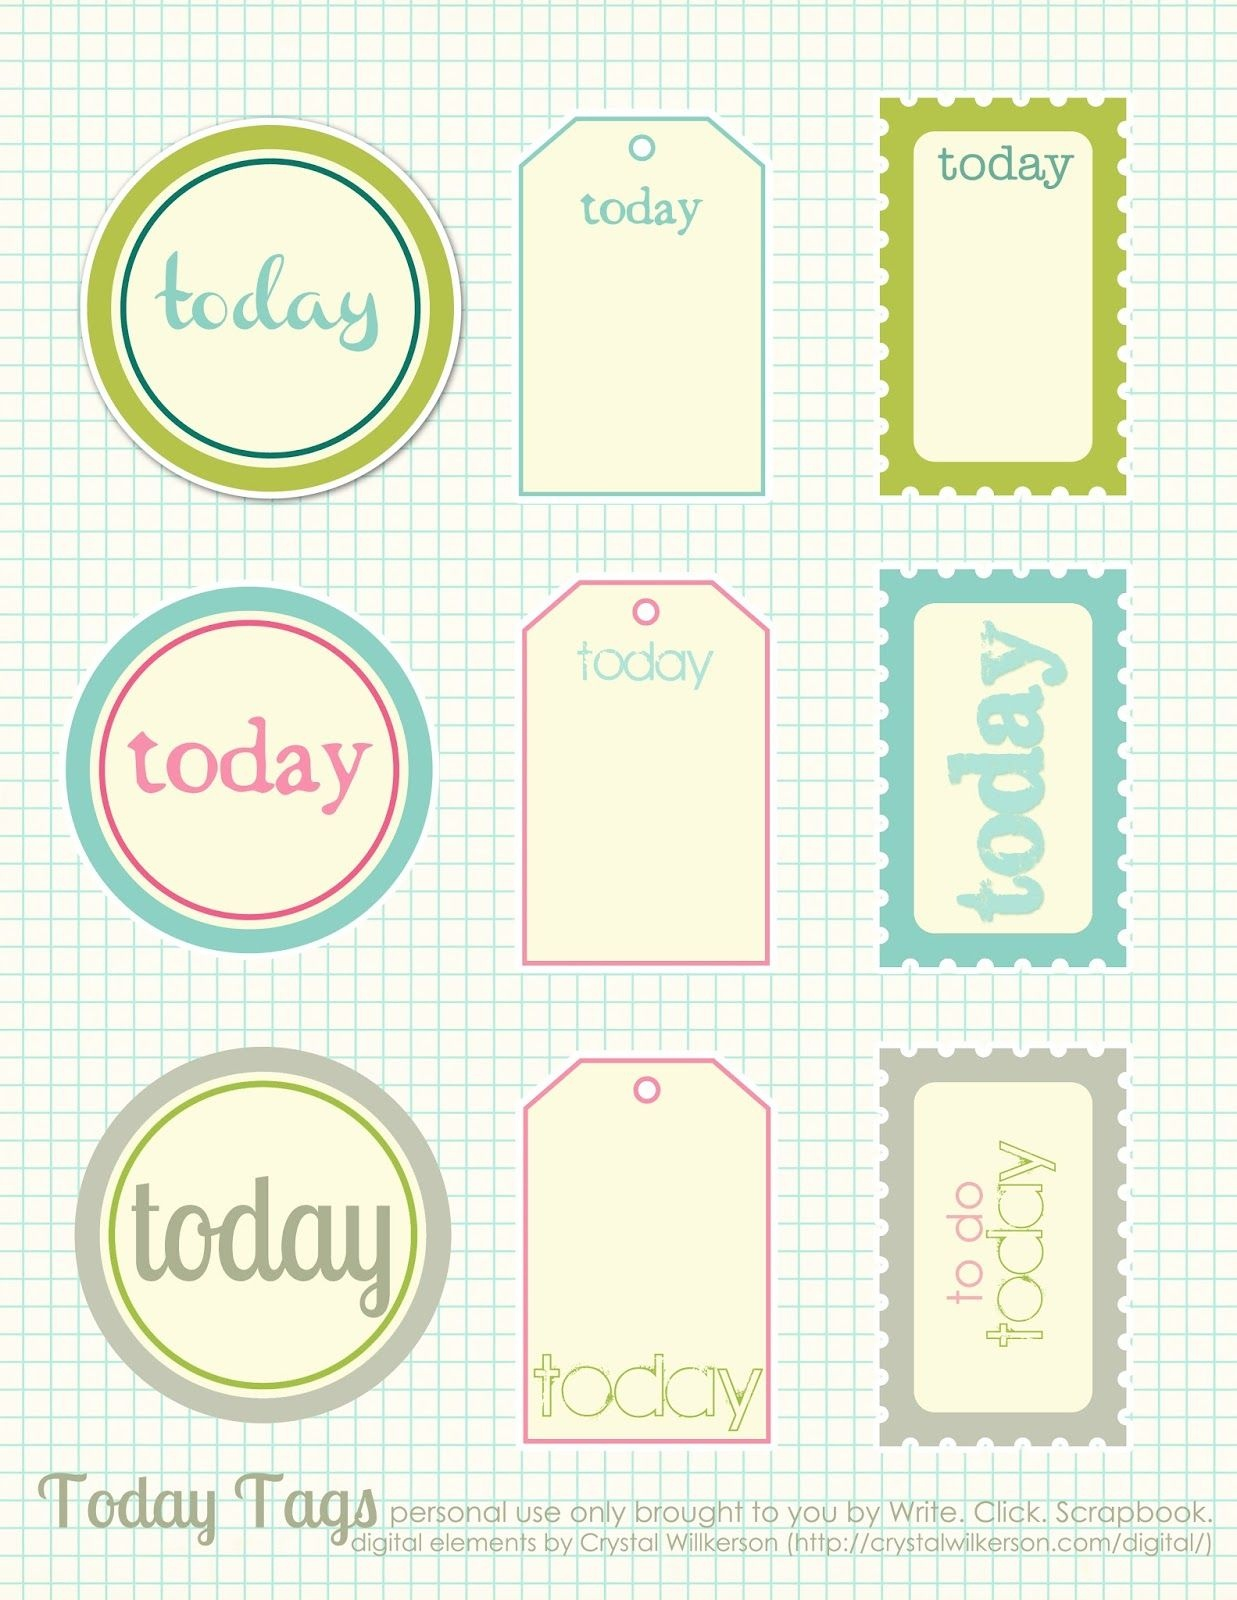 Free Printable Scrapbook Cutouts | Printable For All Topics - Free Printable Scrapbook Pages